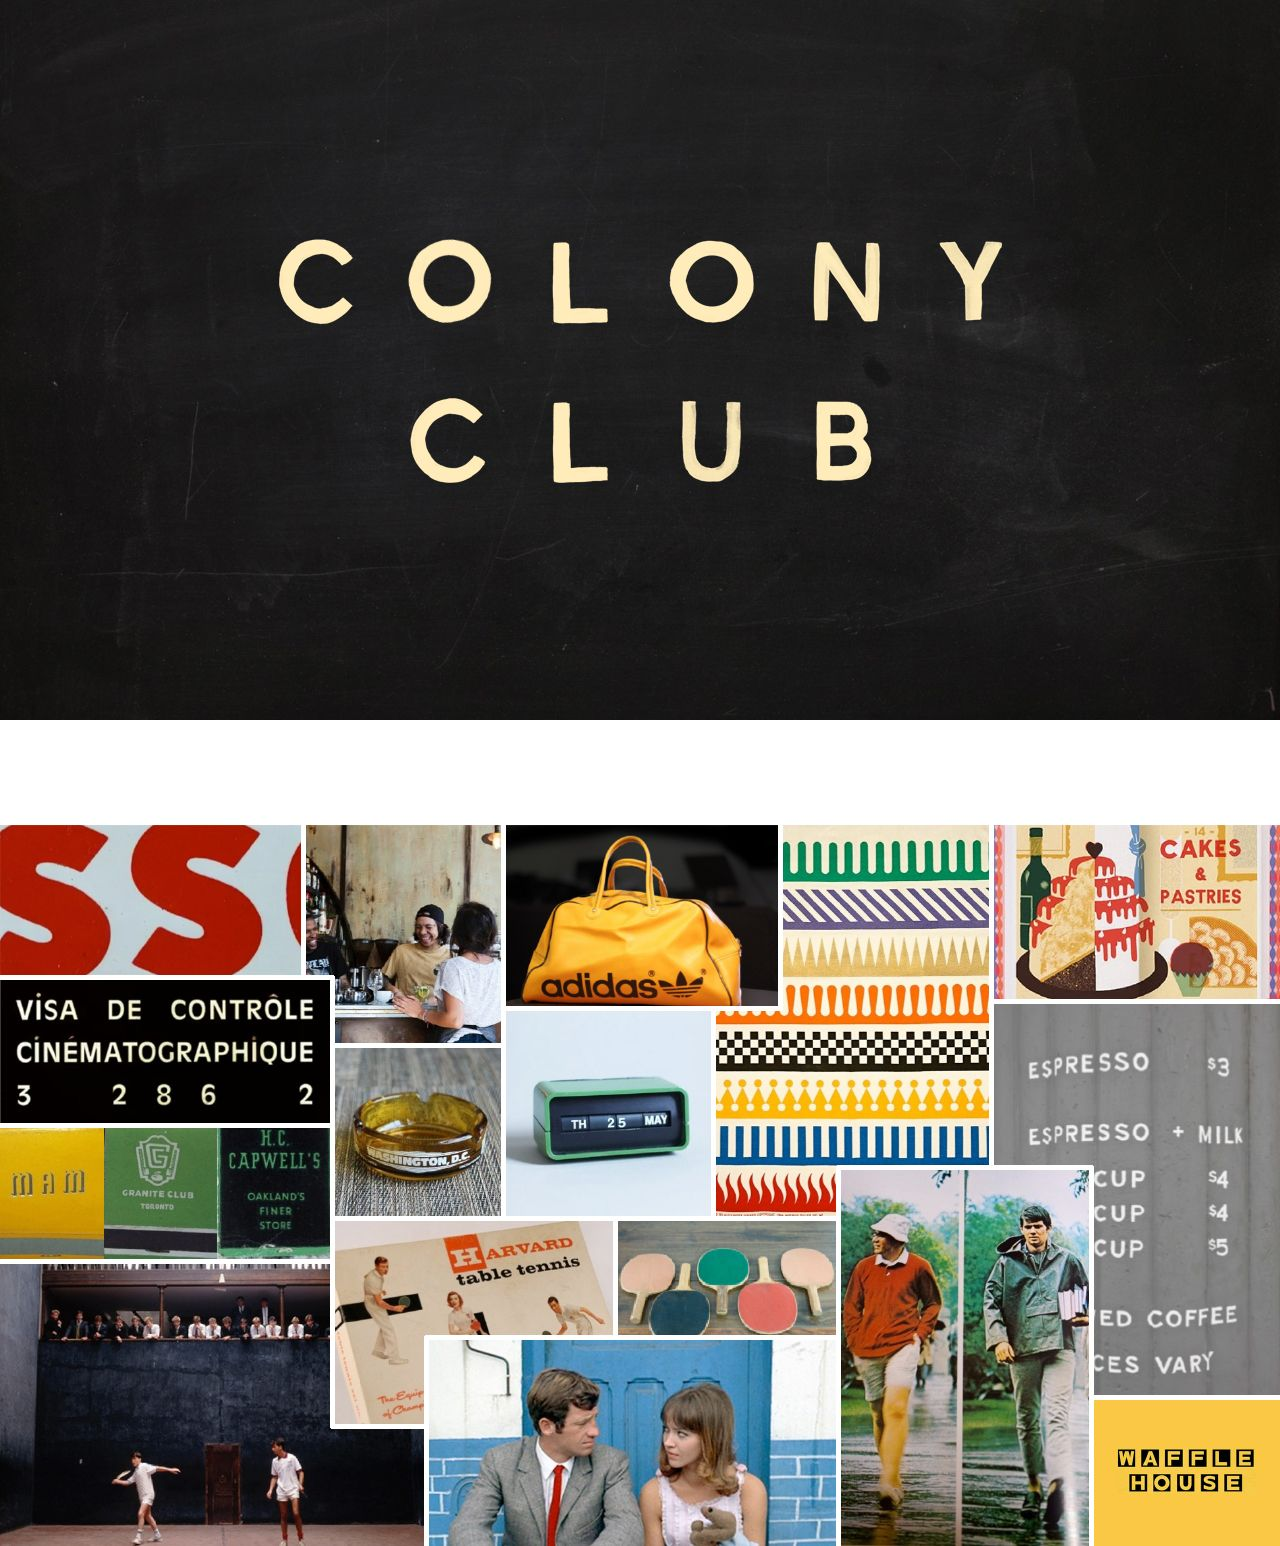 Colony Club Colony Club is a new neighborhood restaurant